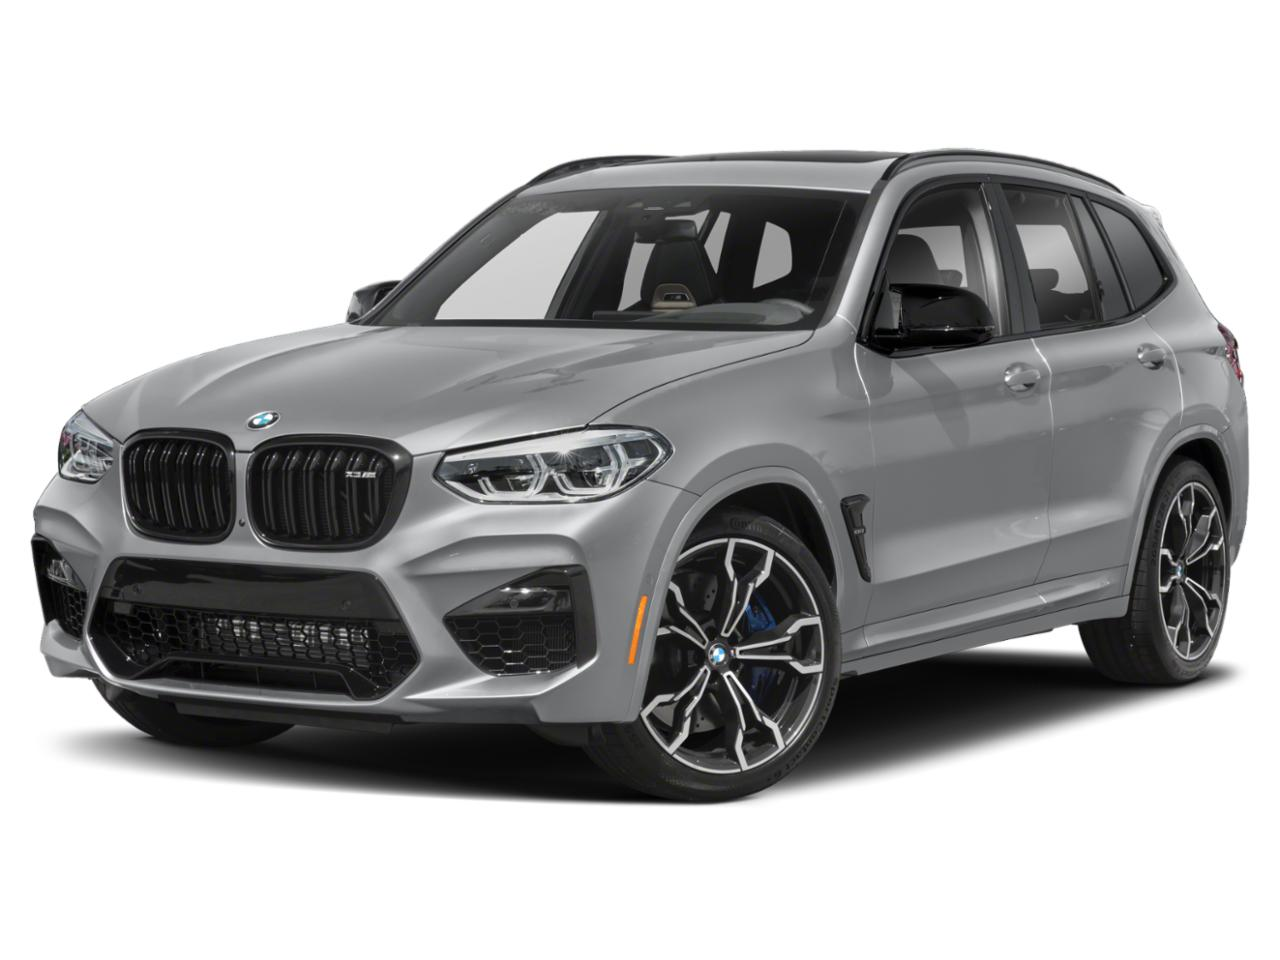 2021 BMW X3 M Vehicle Photo in Grapevine, TX 76051